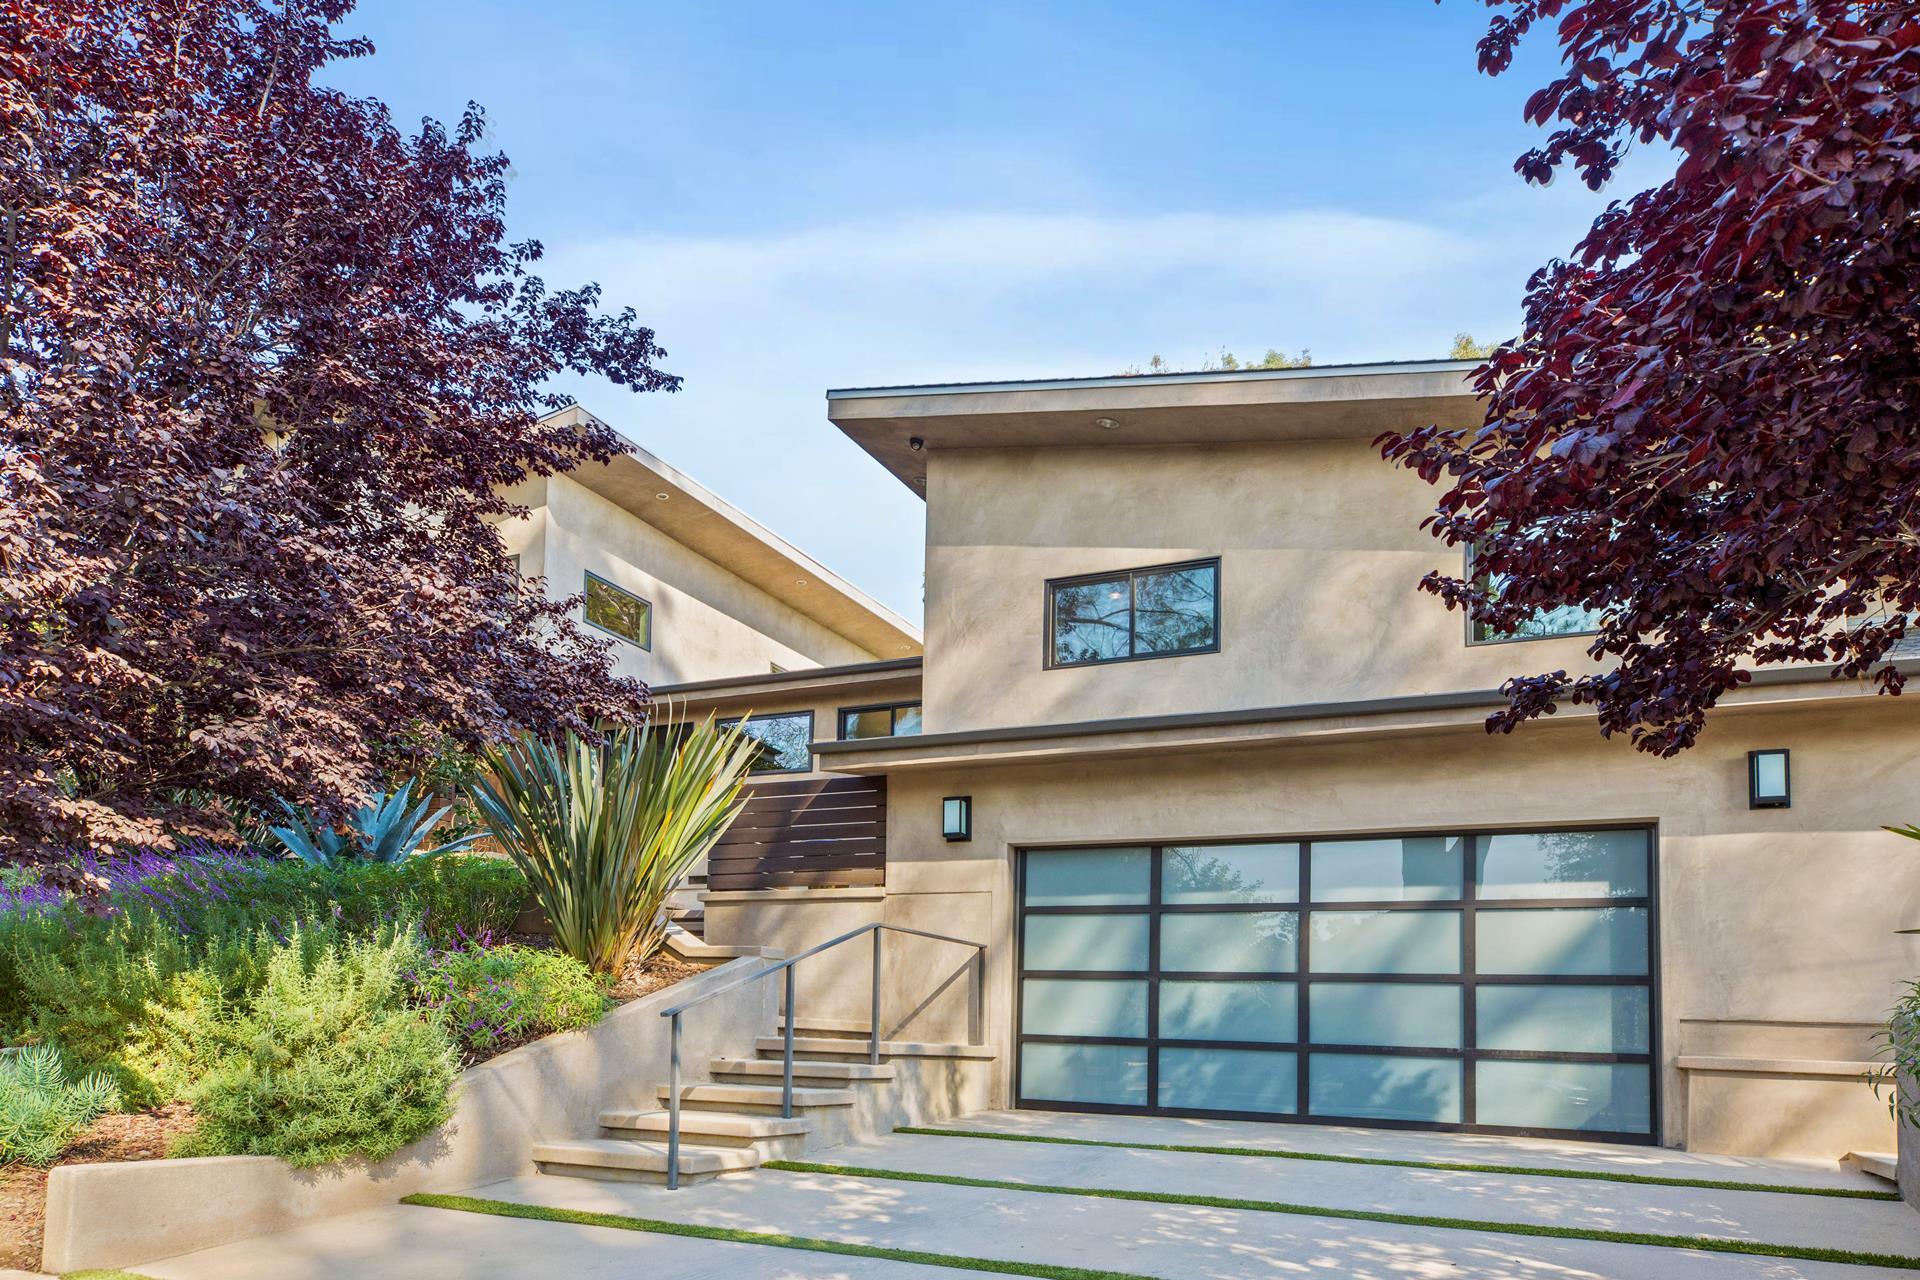 510 N KENTER Avenue - Brentwood, California